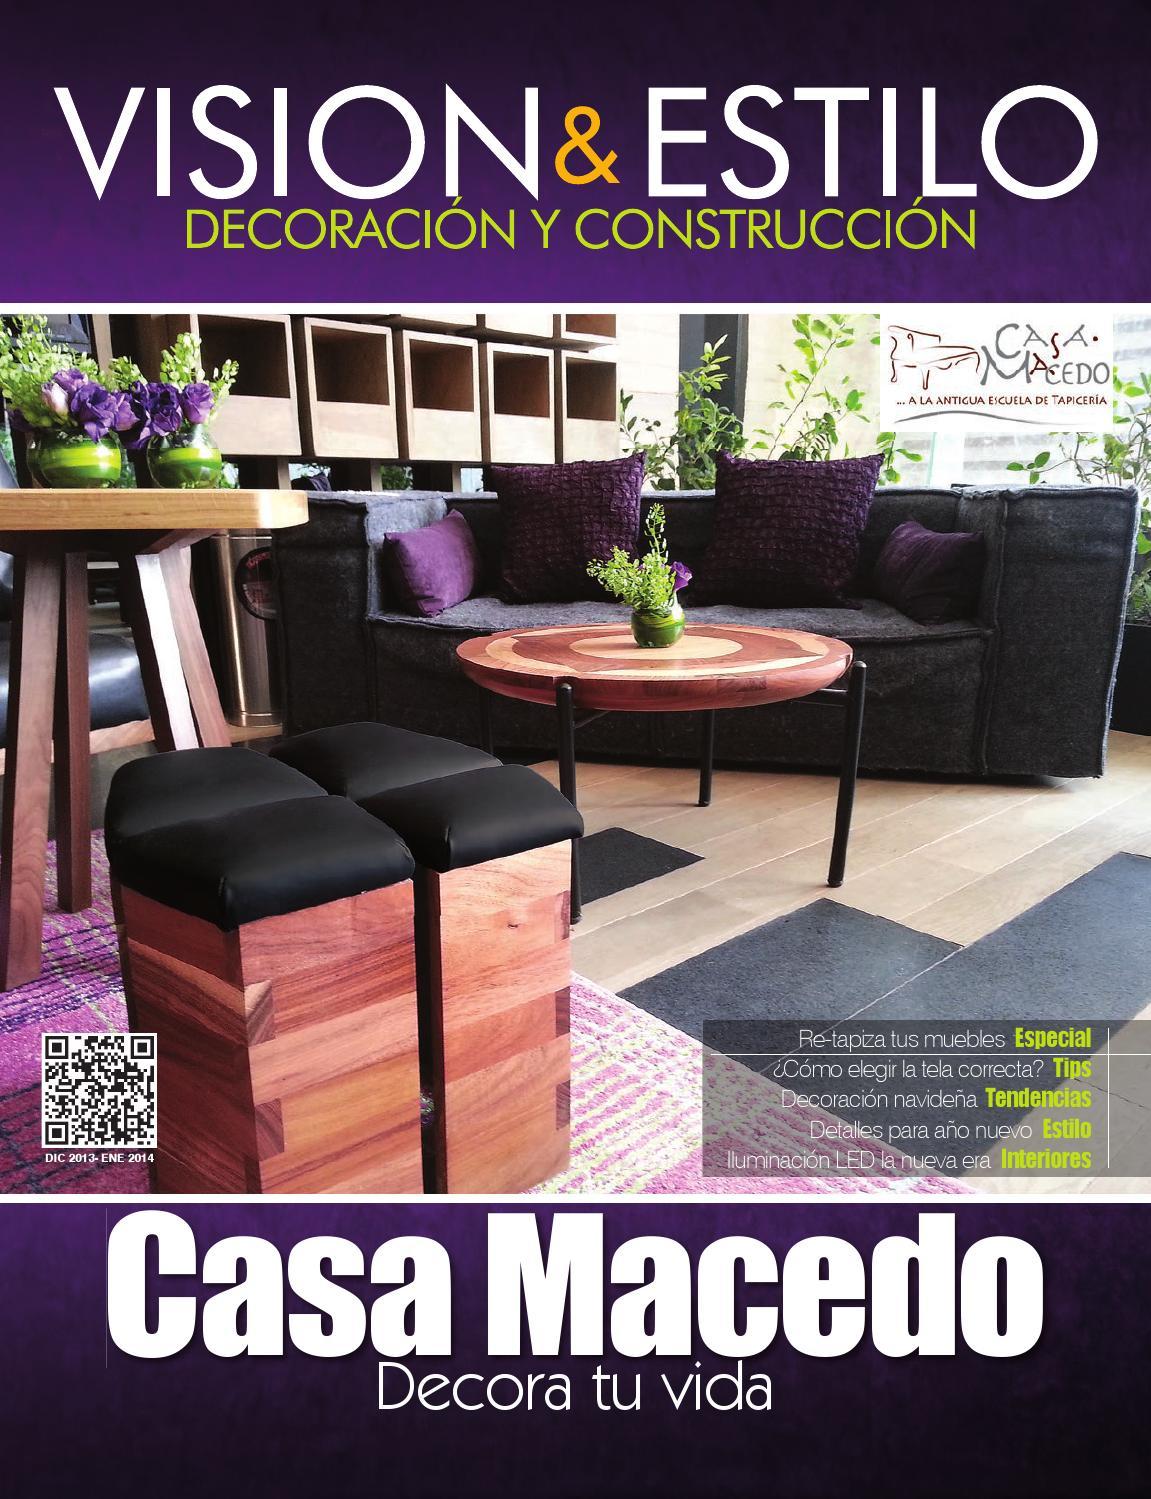 Efecto de Lino Moderno Durable suave Chenilla Mobiliario Negro Tela De Tapicería